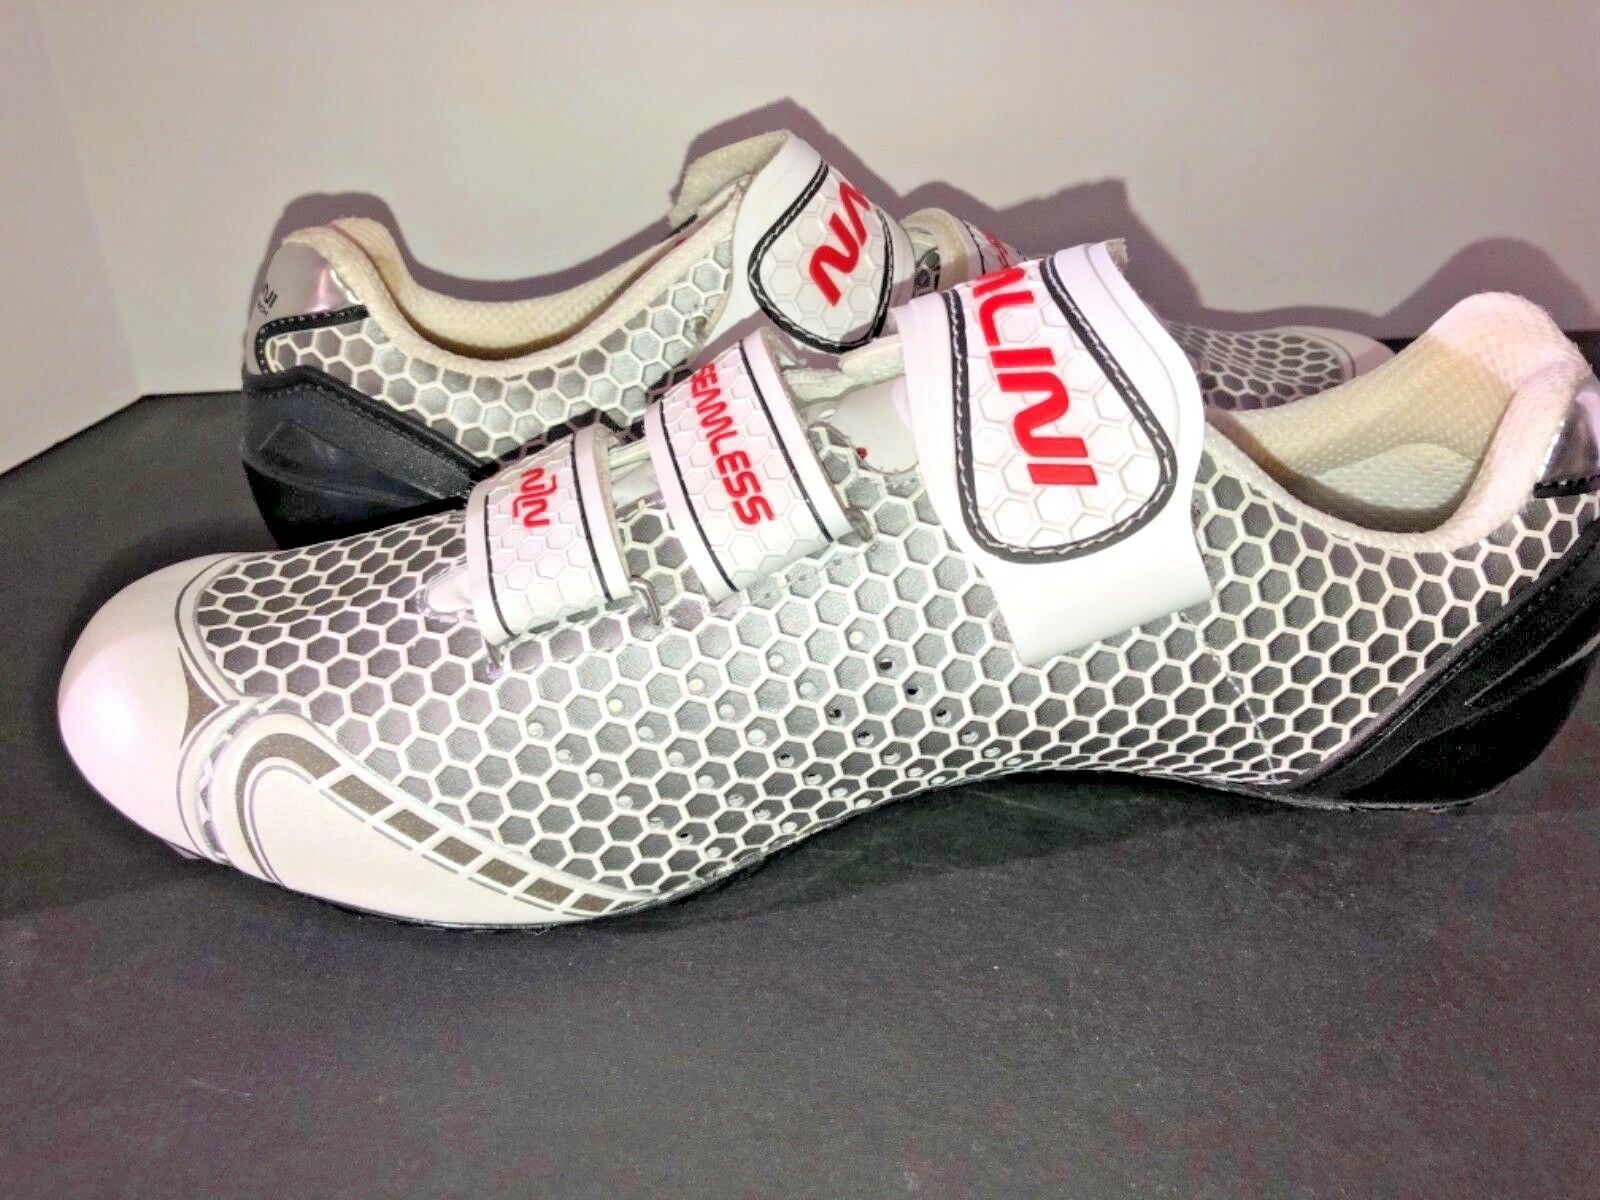 NWOT NWOT NWOT NALINI KRAKEN HF SEAMLESS Weiß UNISEX CYCLING Schuhe SIZE 44 c833a5